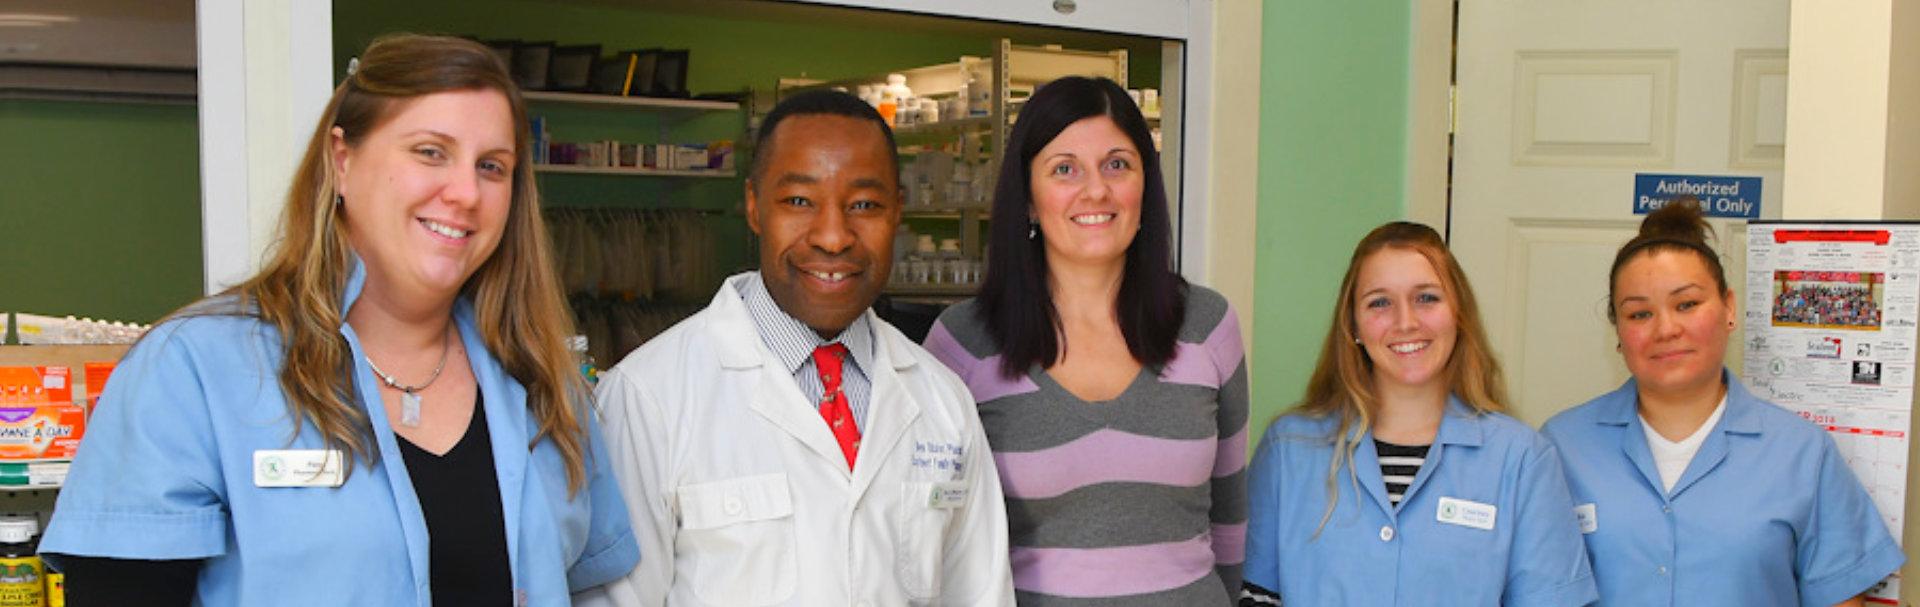 pharmacist showing her genuine smile